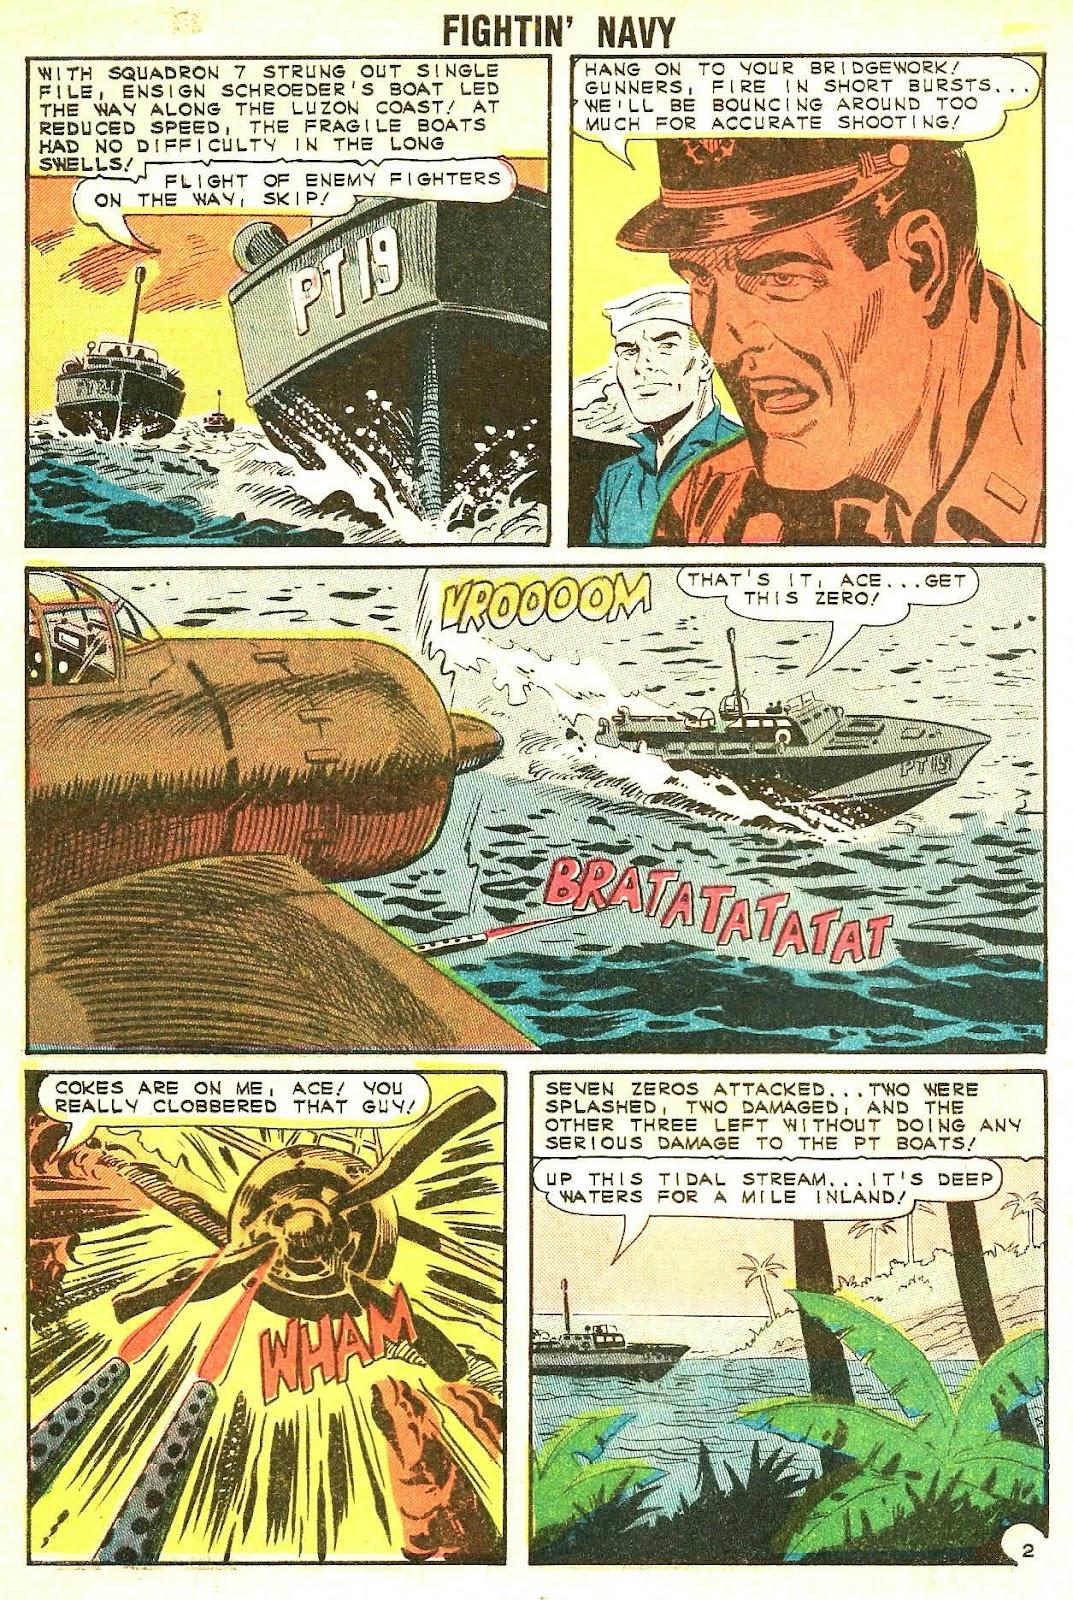 Read online Fightin' Navy comic -  Issue #117 - 4